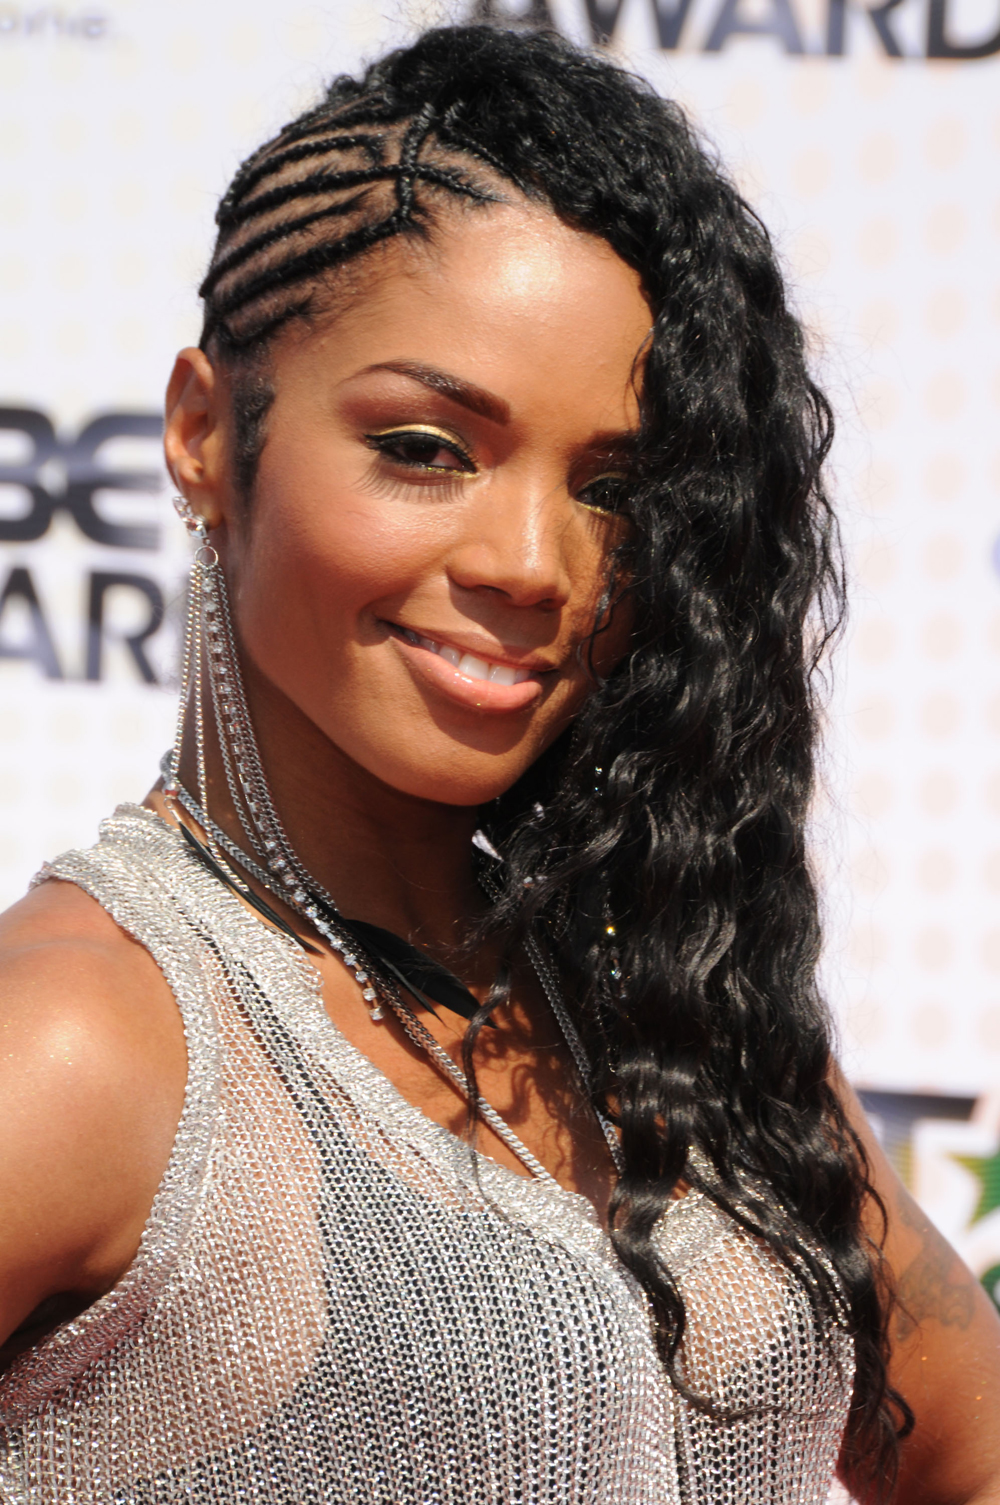 Rasheeda Hair Talk with Ebony C. Princess - Longing 4 Length